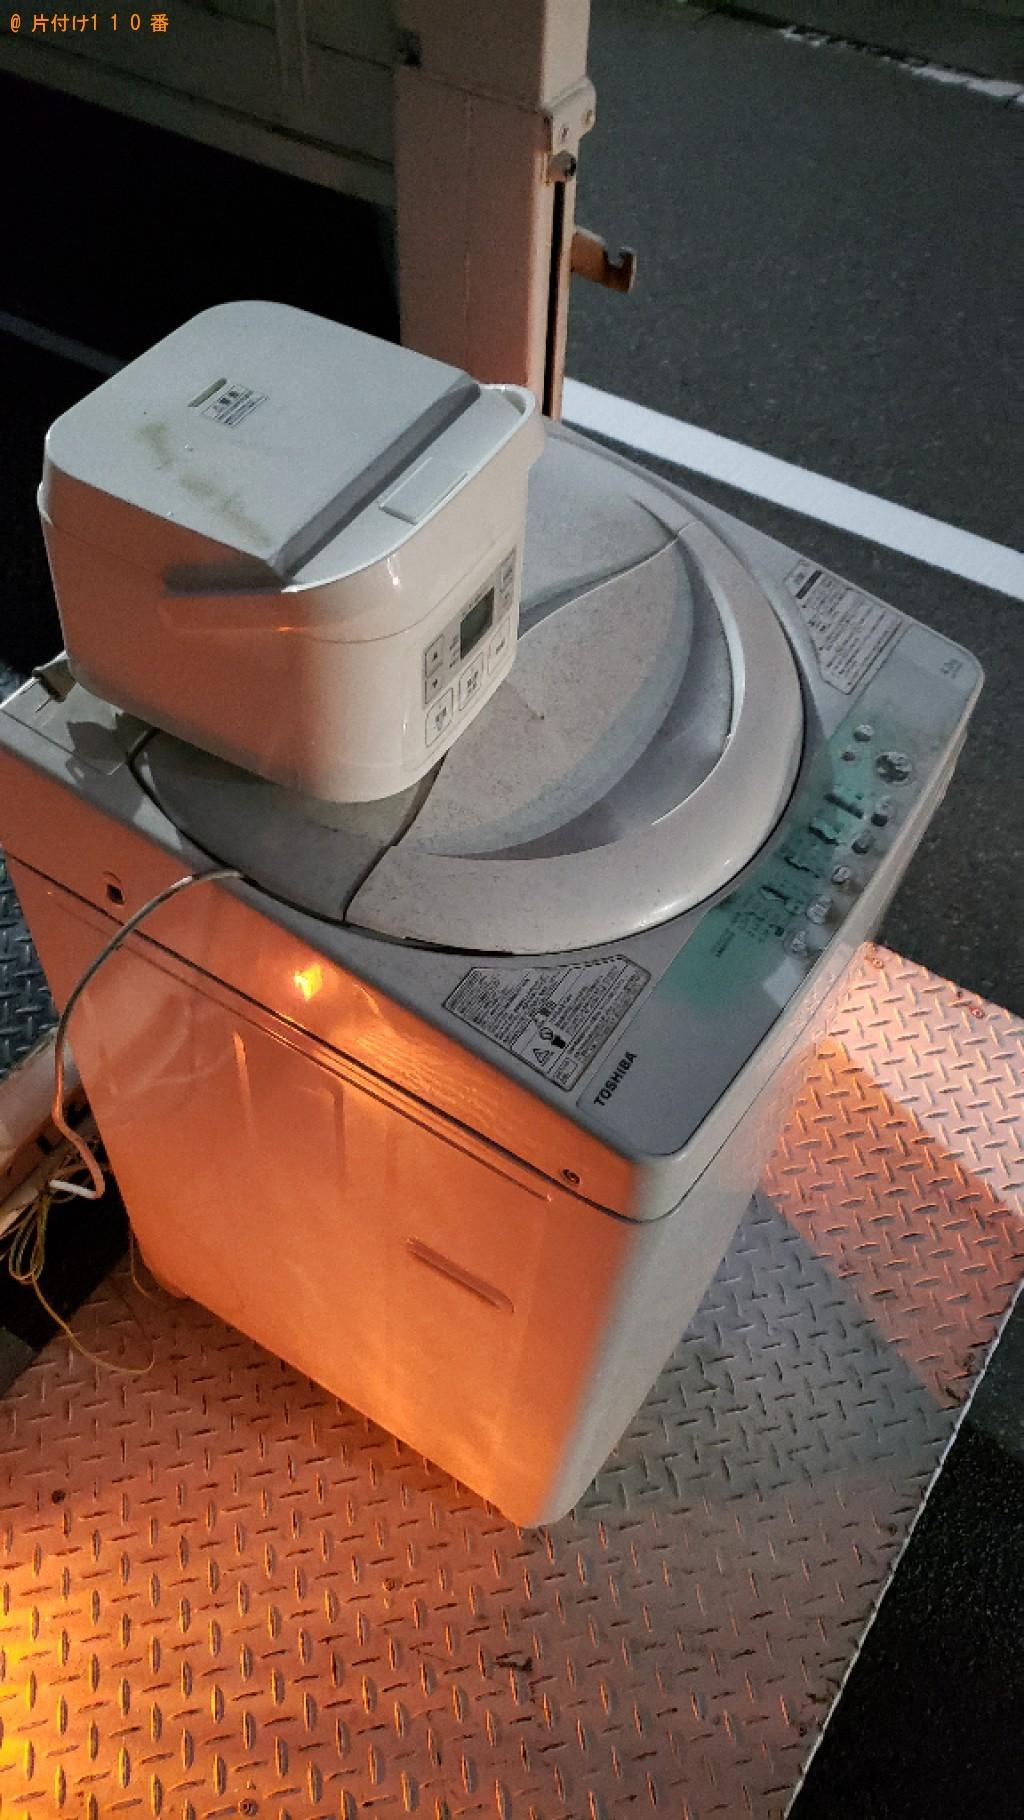 【仙台市】洗濯機、炊飯器の回収・処分ご依頼 お客様の声